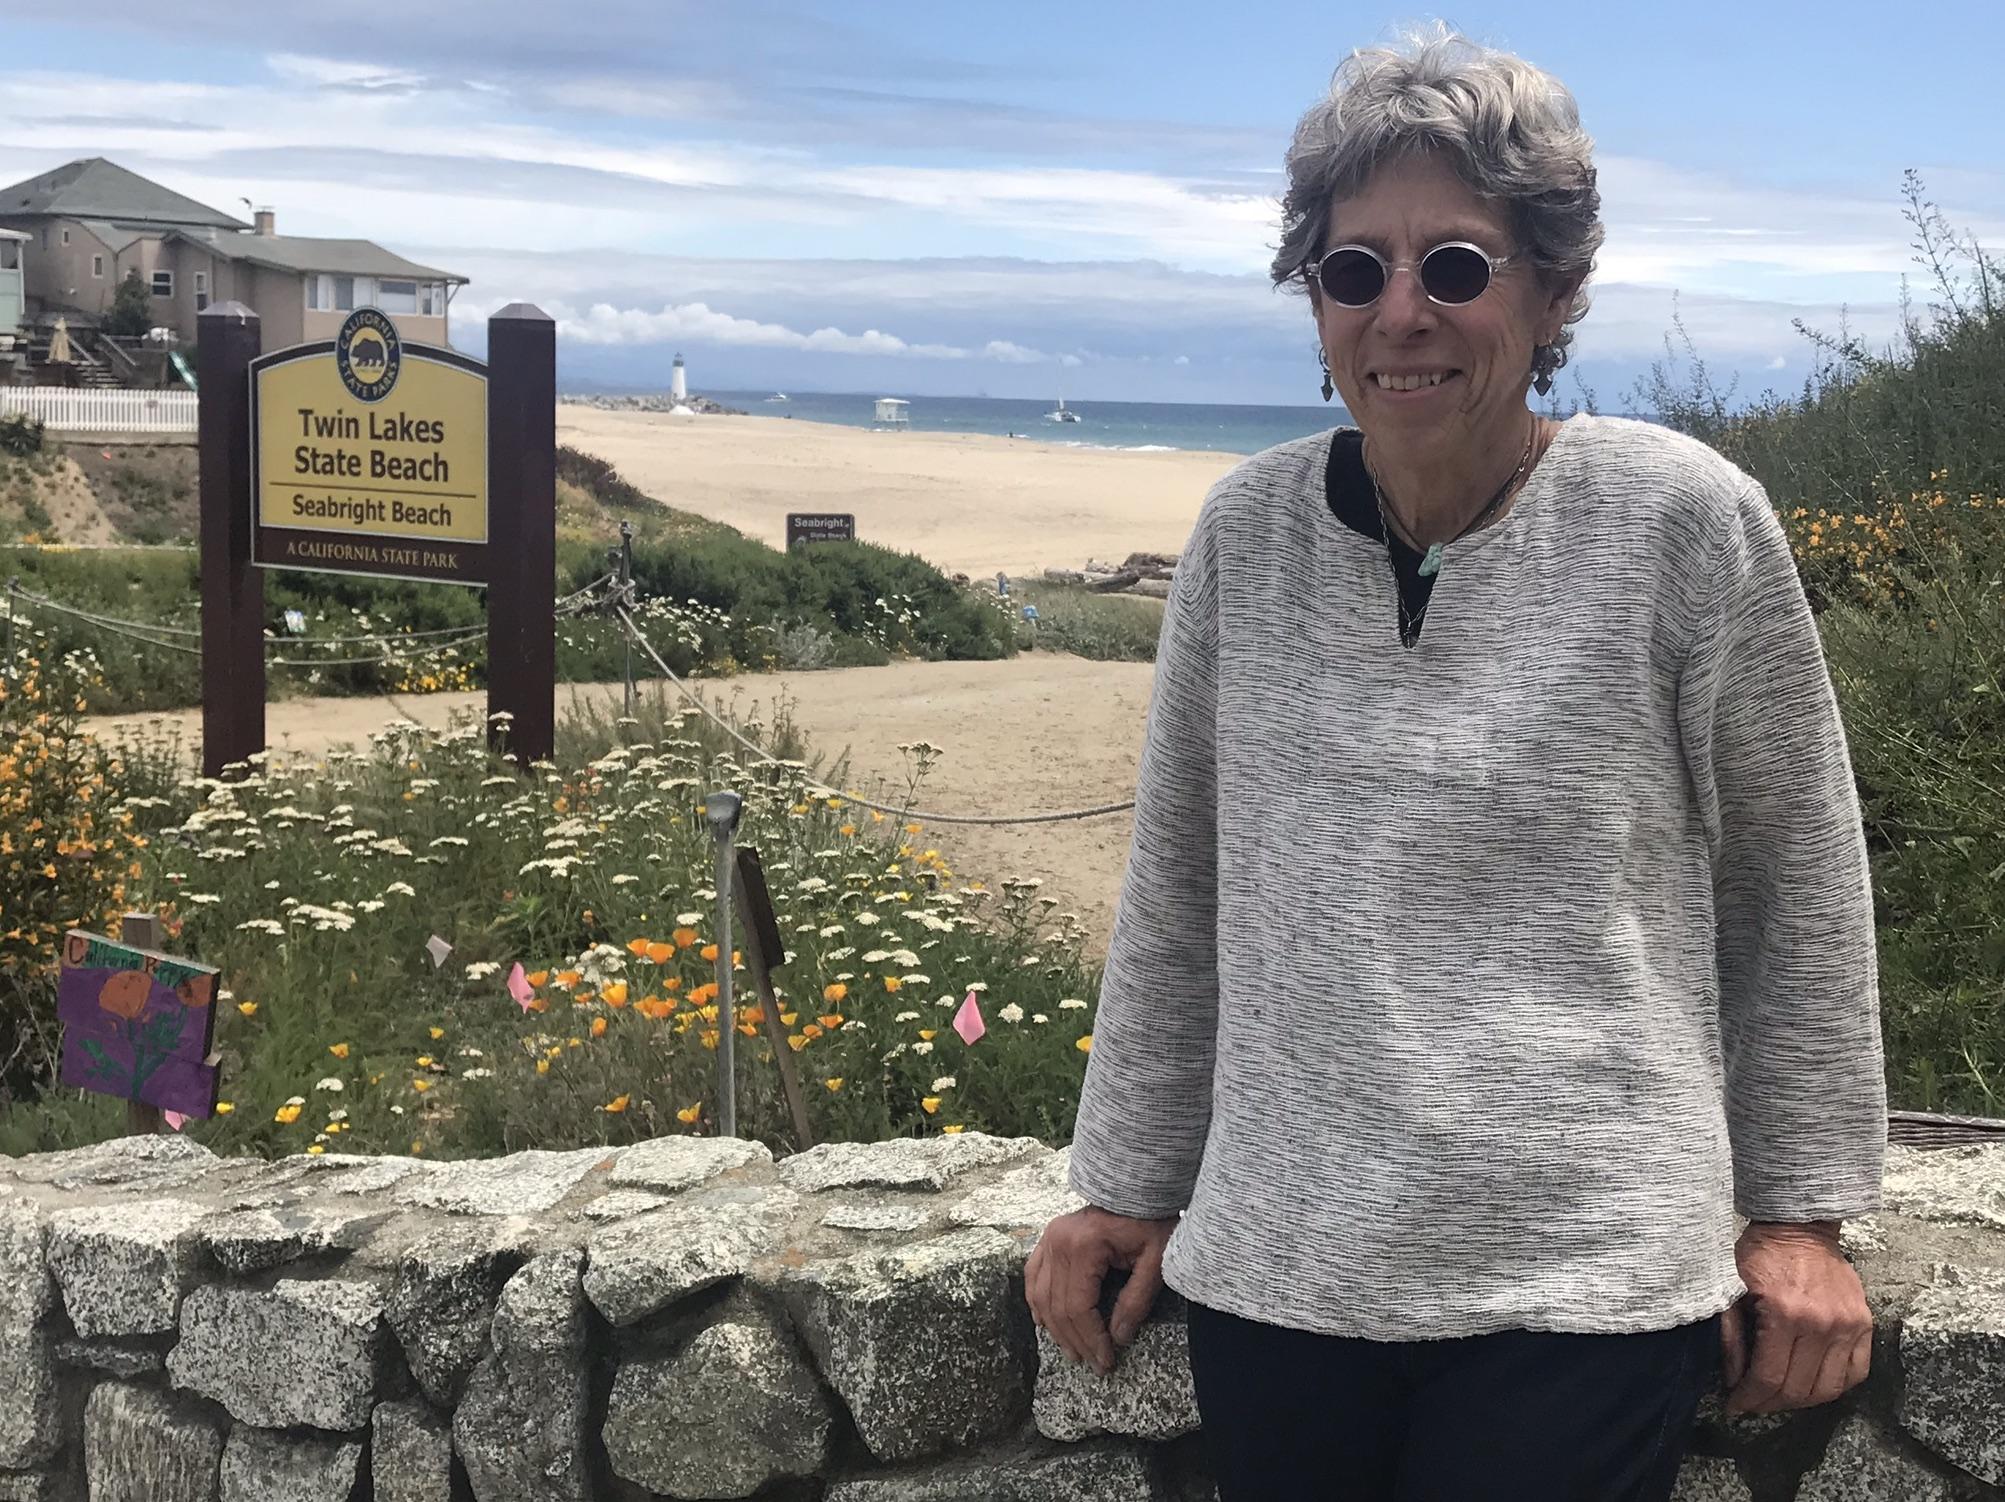 Joanne Curby, Seabright Neighborhood Liaison